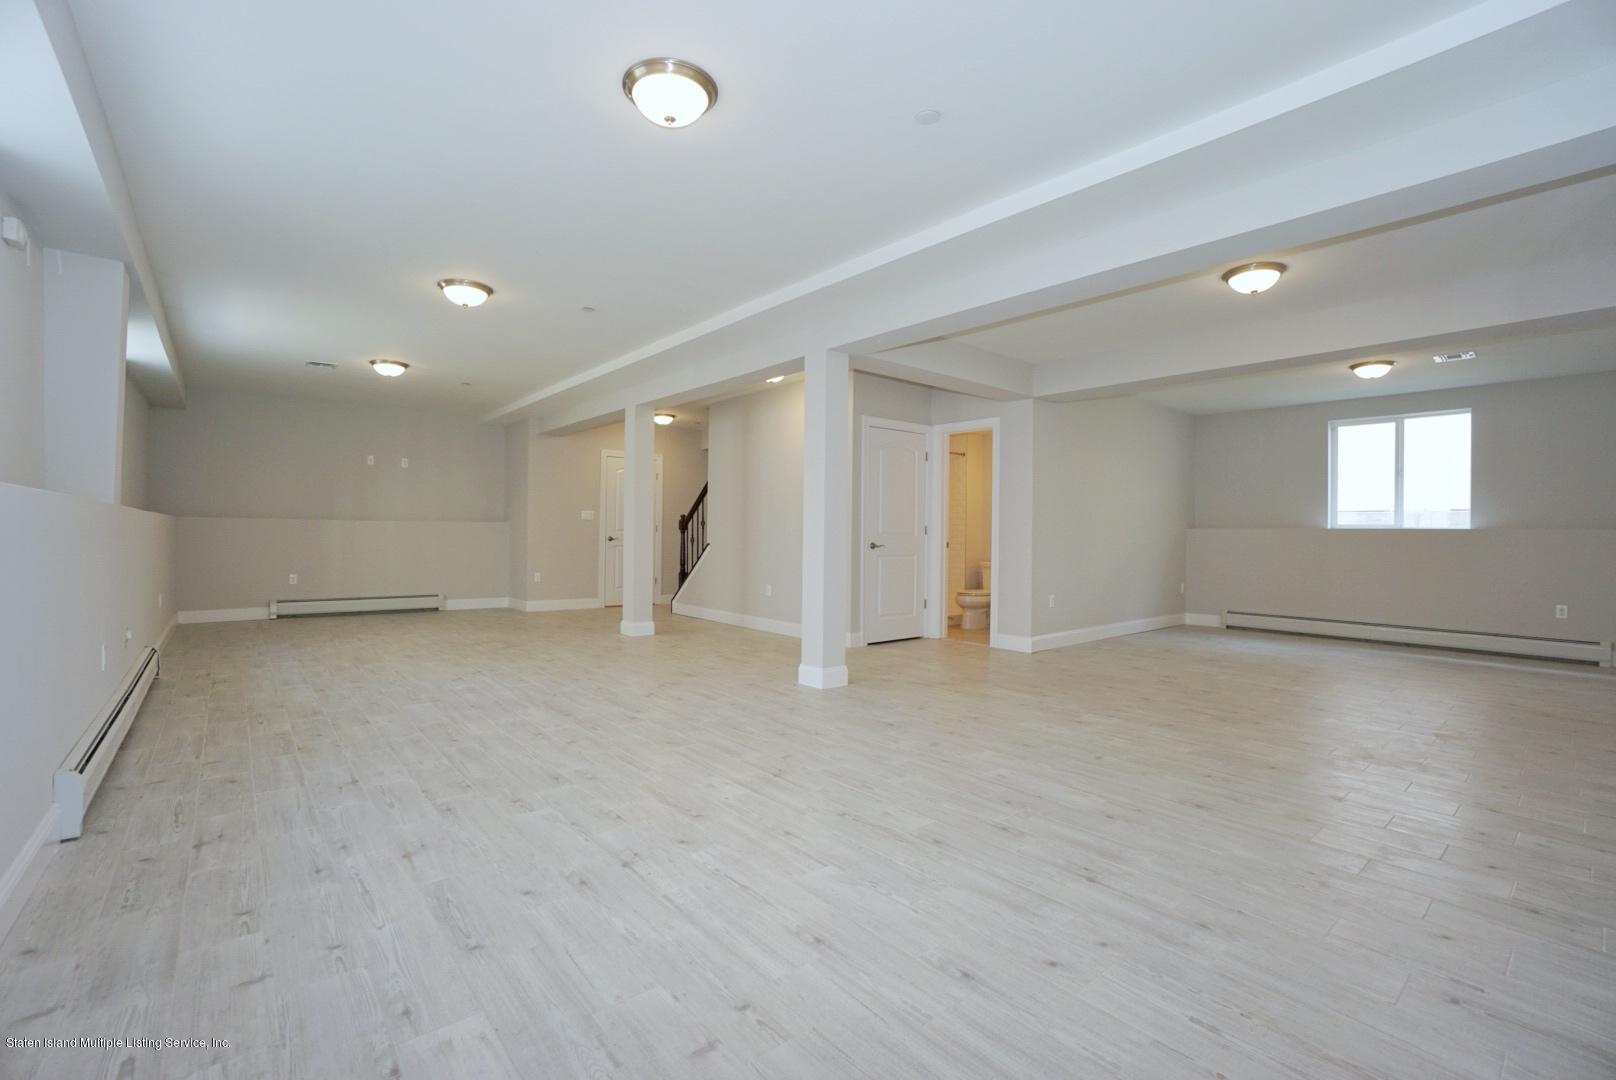 Single Family - Detached 170 Fairview Avenue  Staten Island, NY 10314, MLS-1126684-58